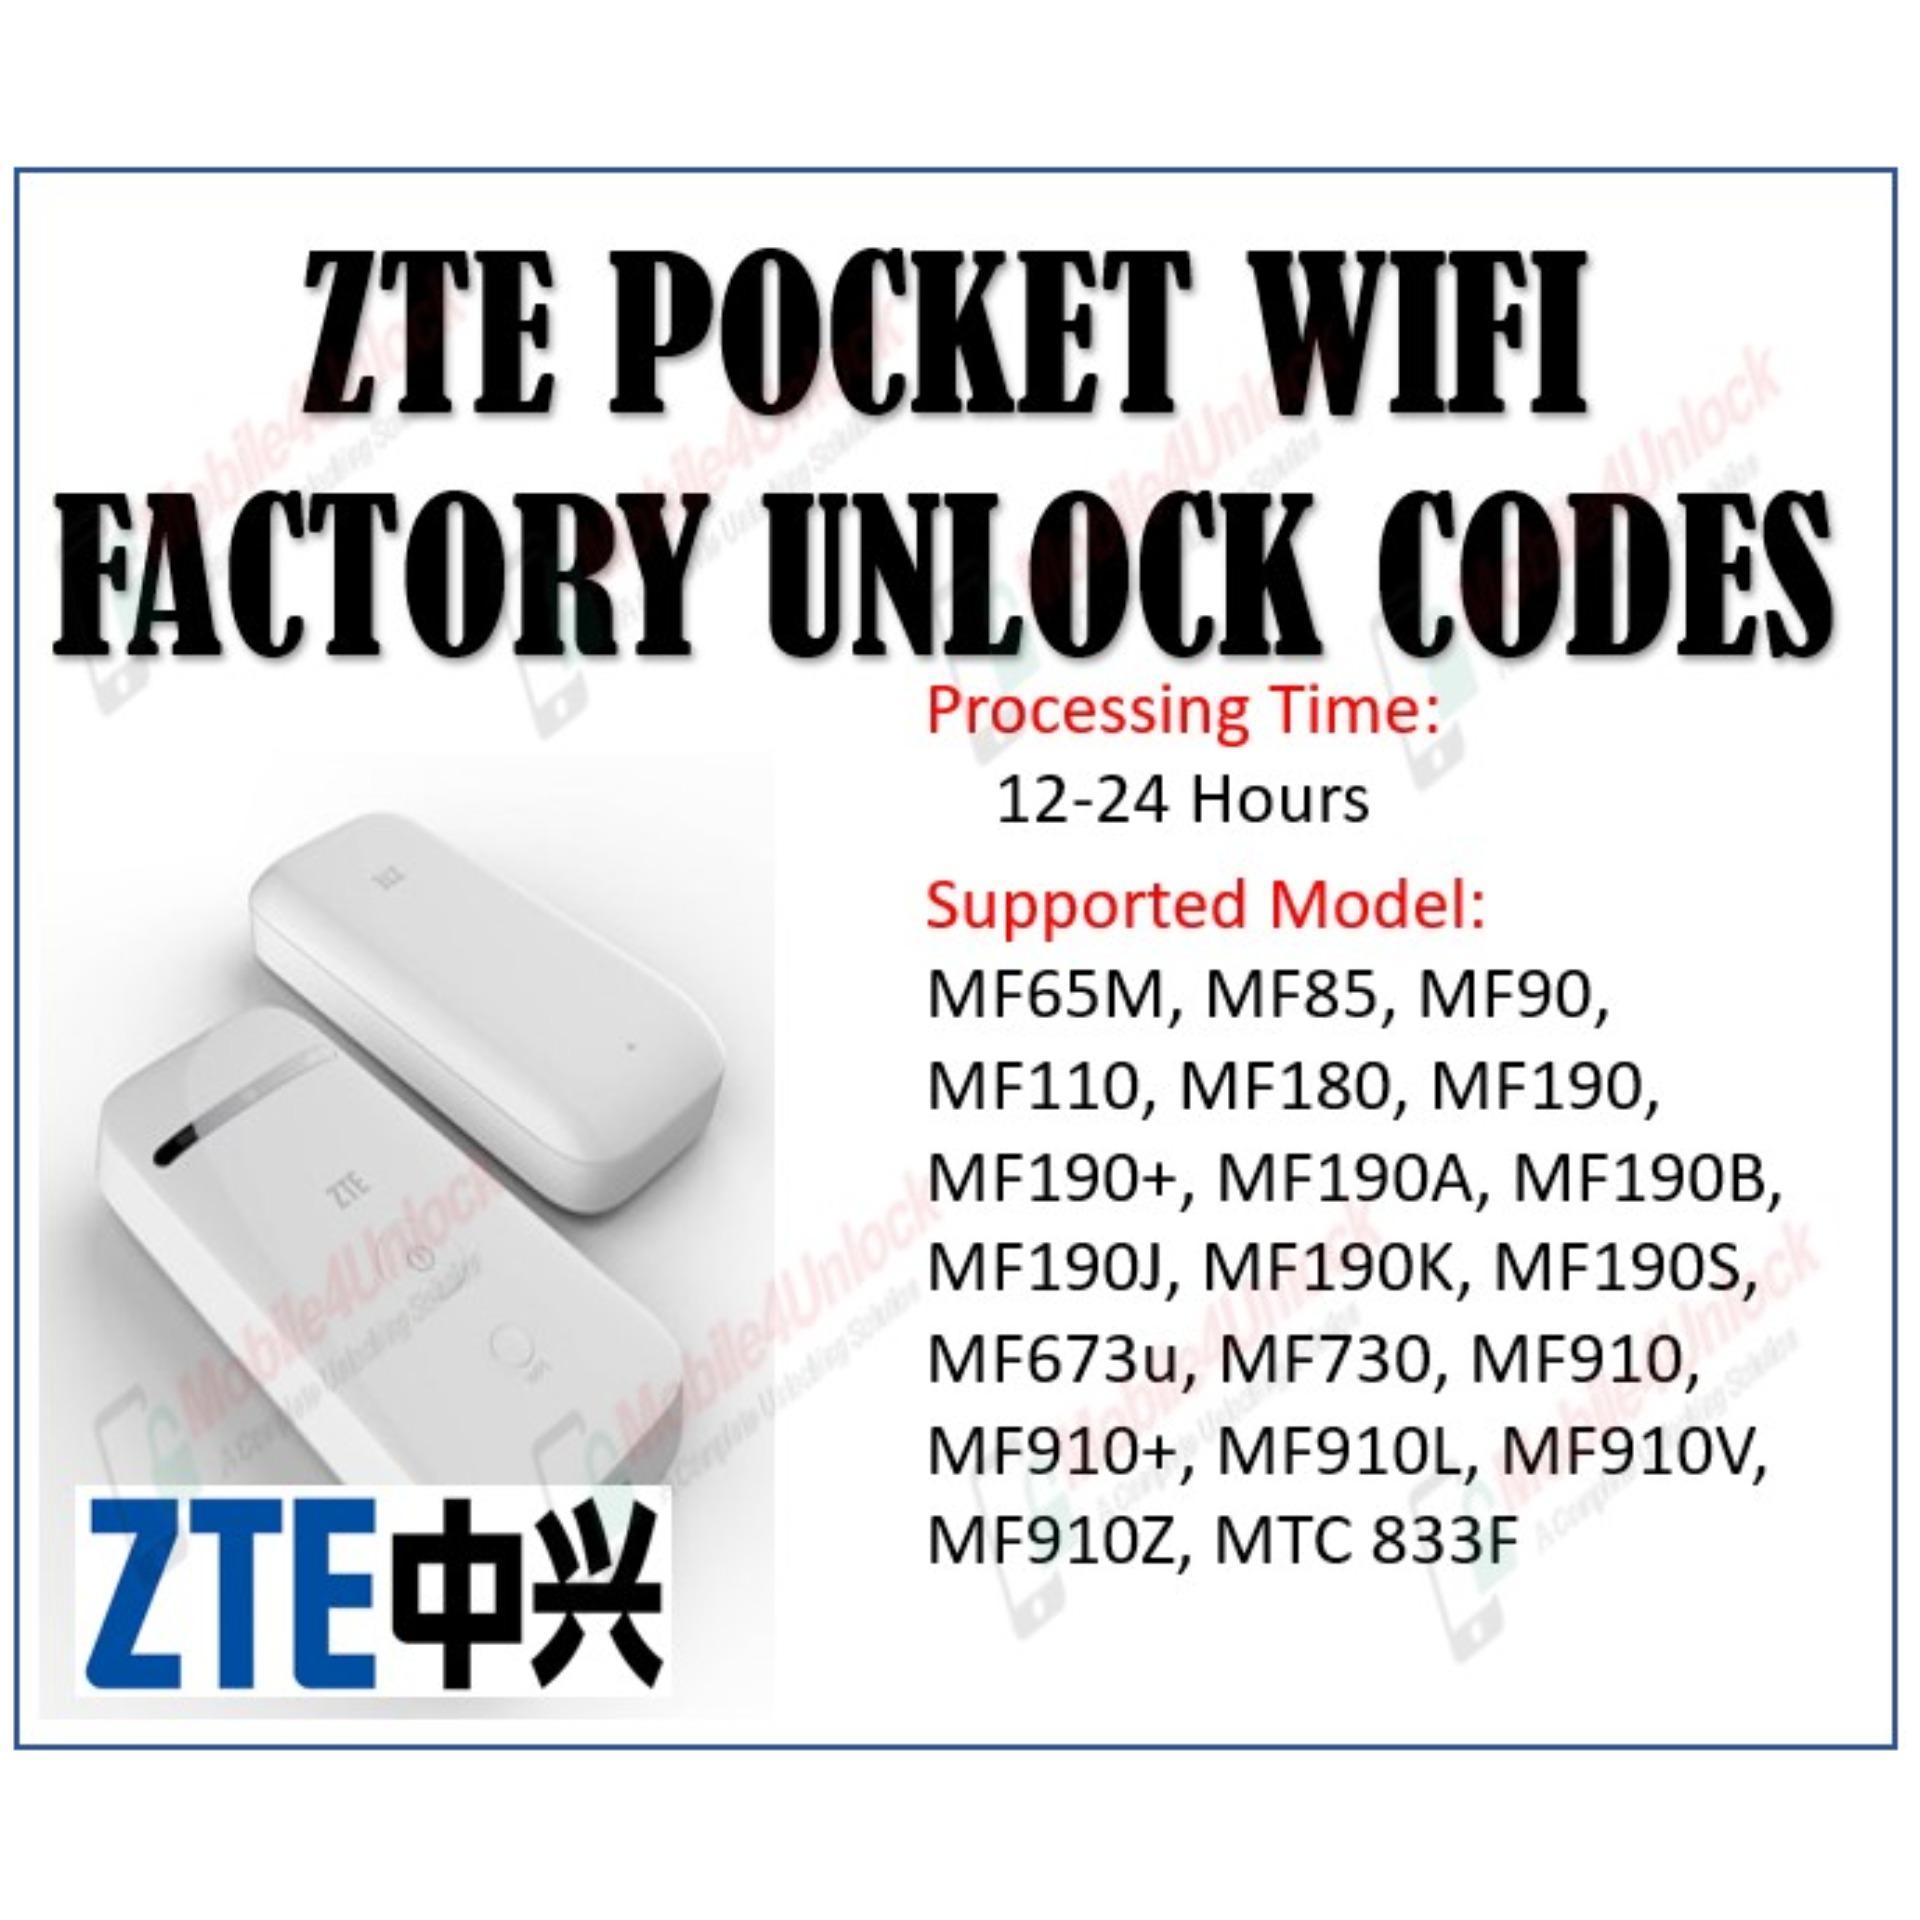 🏆 Unlock code for zte pocket wifi | How to unlock ZTE ZTE